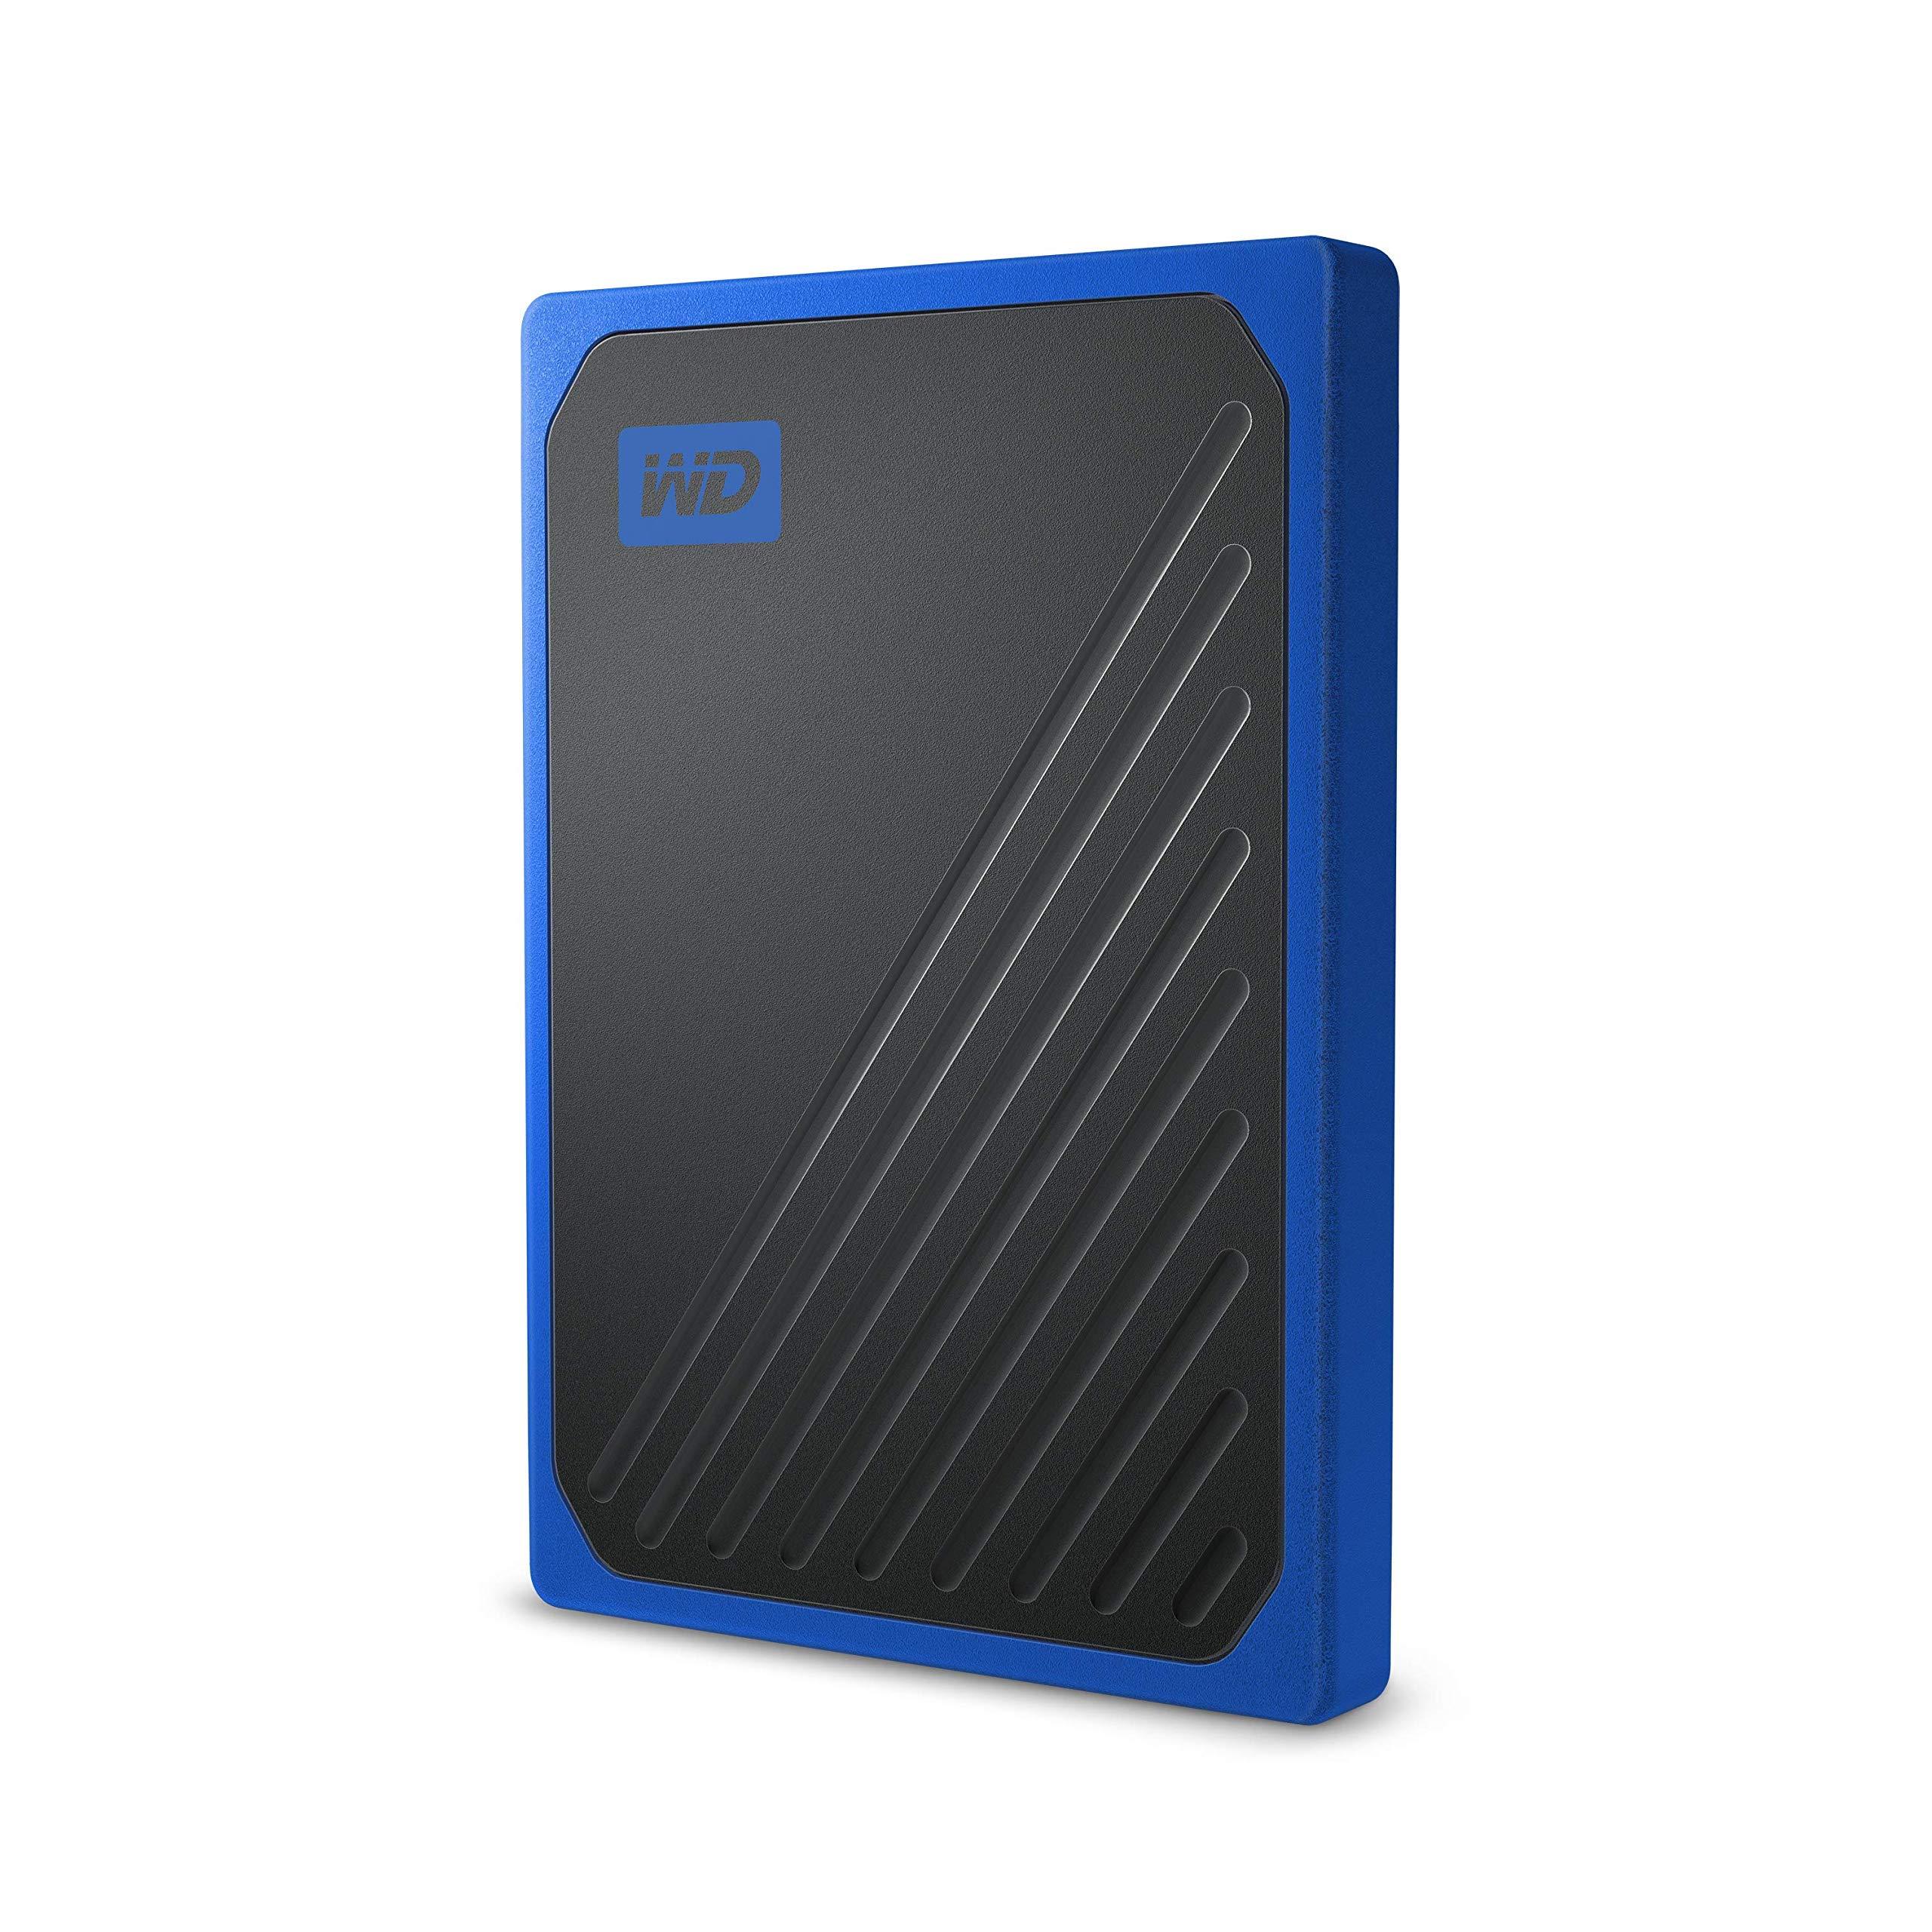 WD 500GB My Passport Go SSD Cobalt Portable External Storage, USB 3.0 - WDBMCG5000ABT-WESN by Western Digital